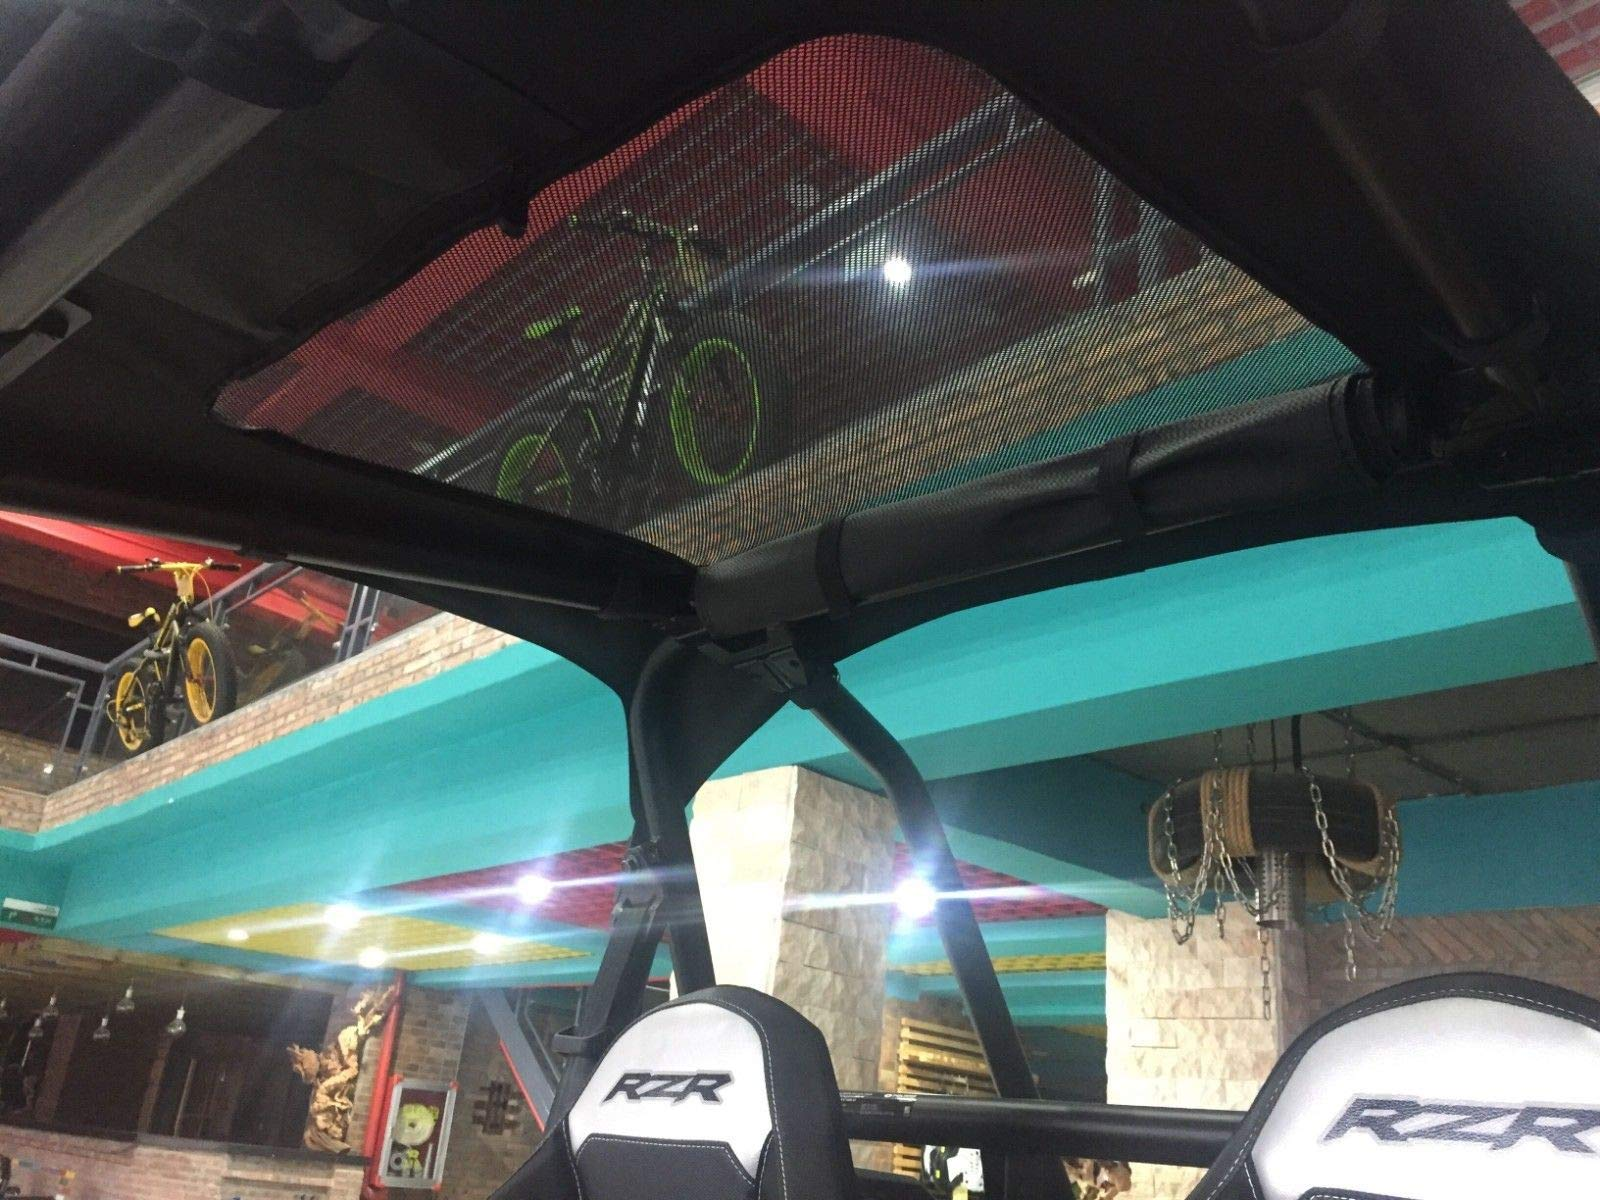 UTV Cab Pack Storage Bag & Soft Roof for Polaris RZR 900 XP 1000 Turbo 900 S Trail by kemimoto (Image #6)